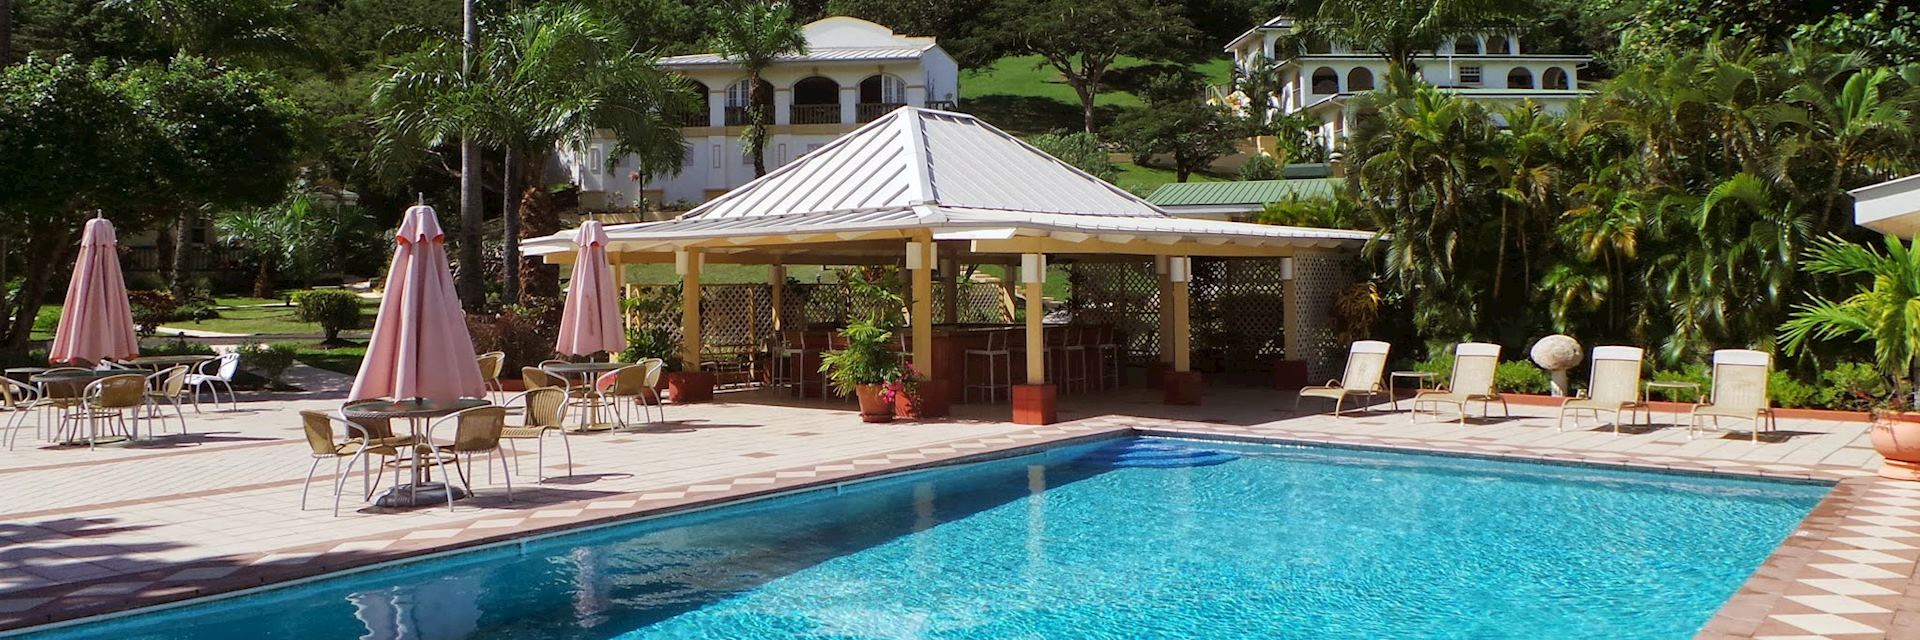 Blue Horizons Garden Resort, Grenada